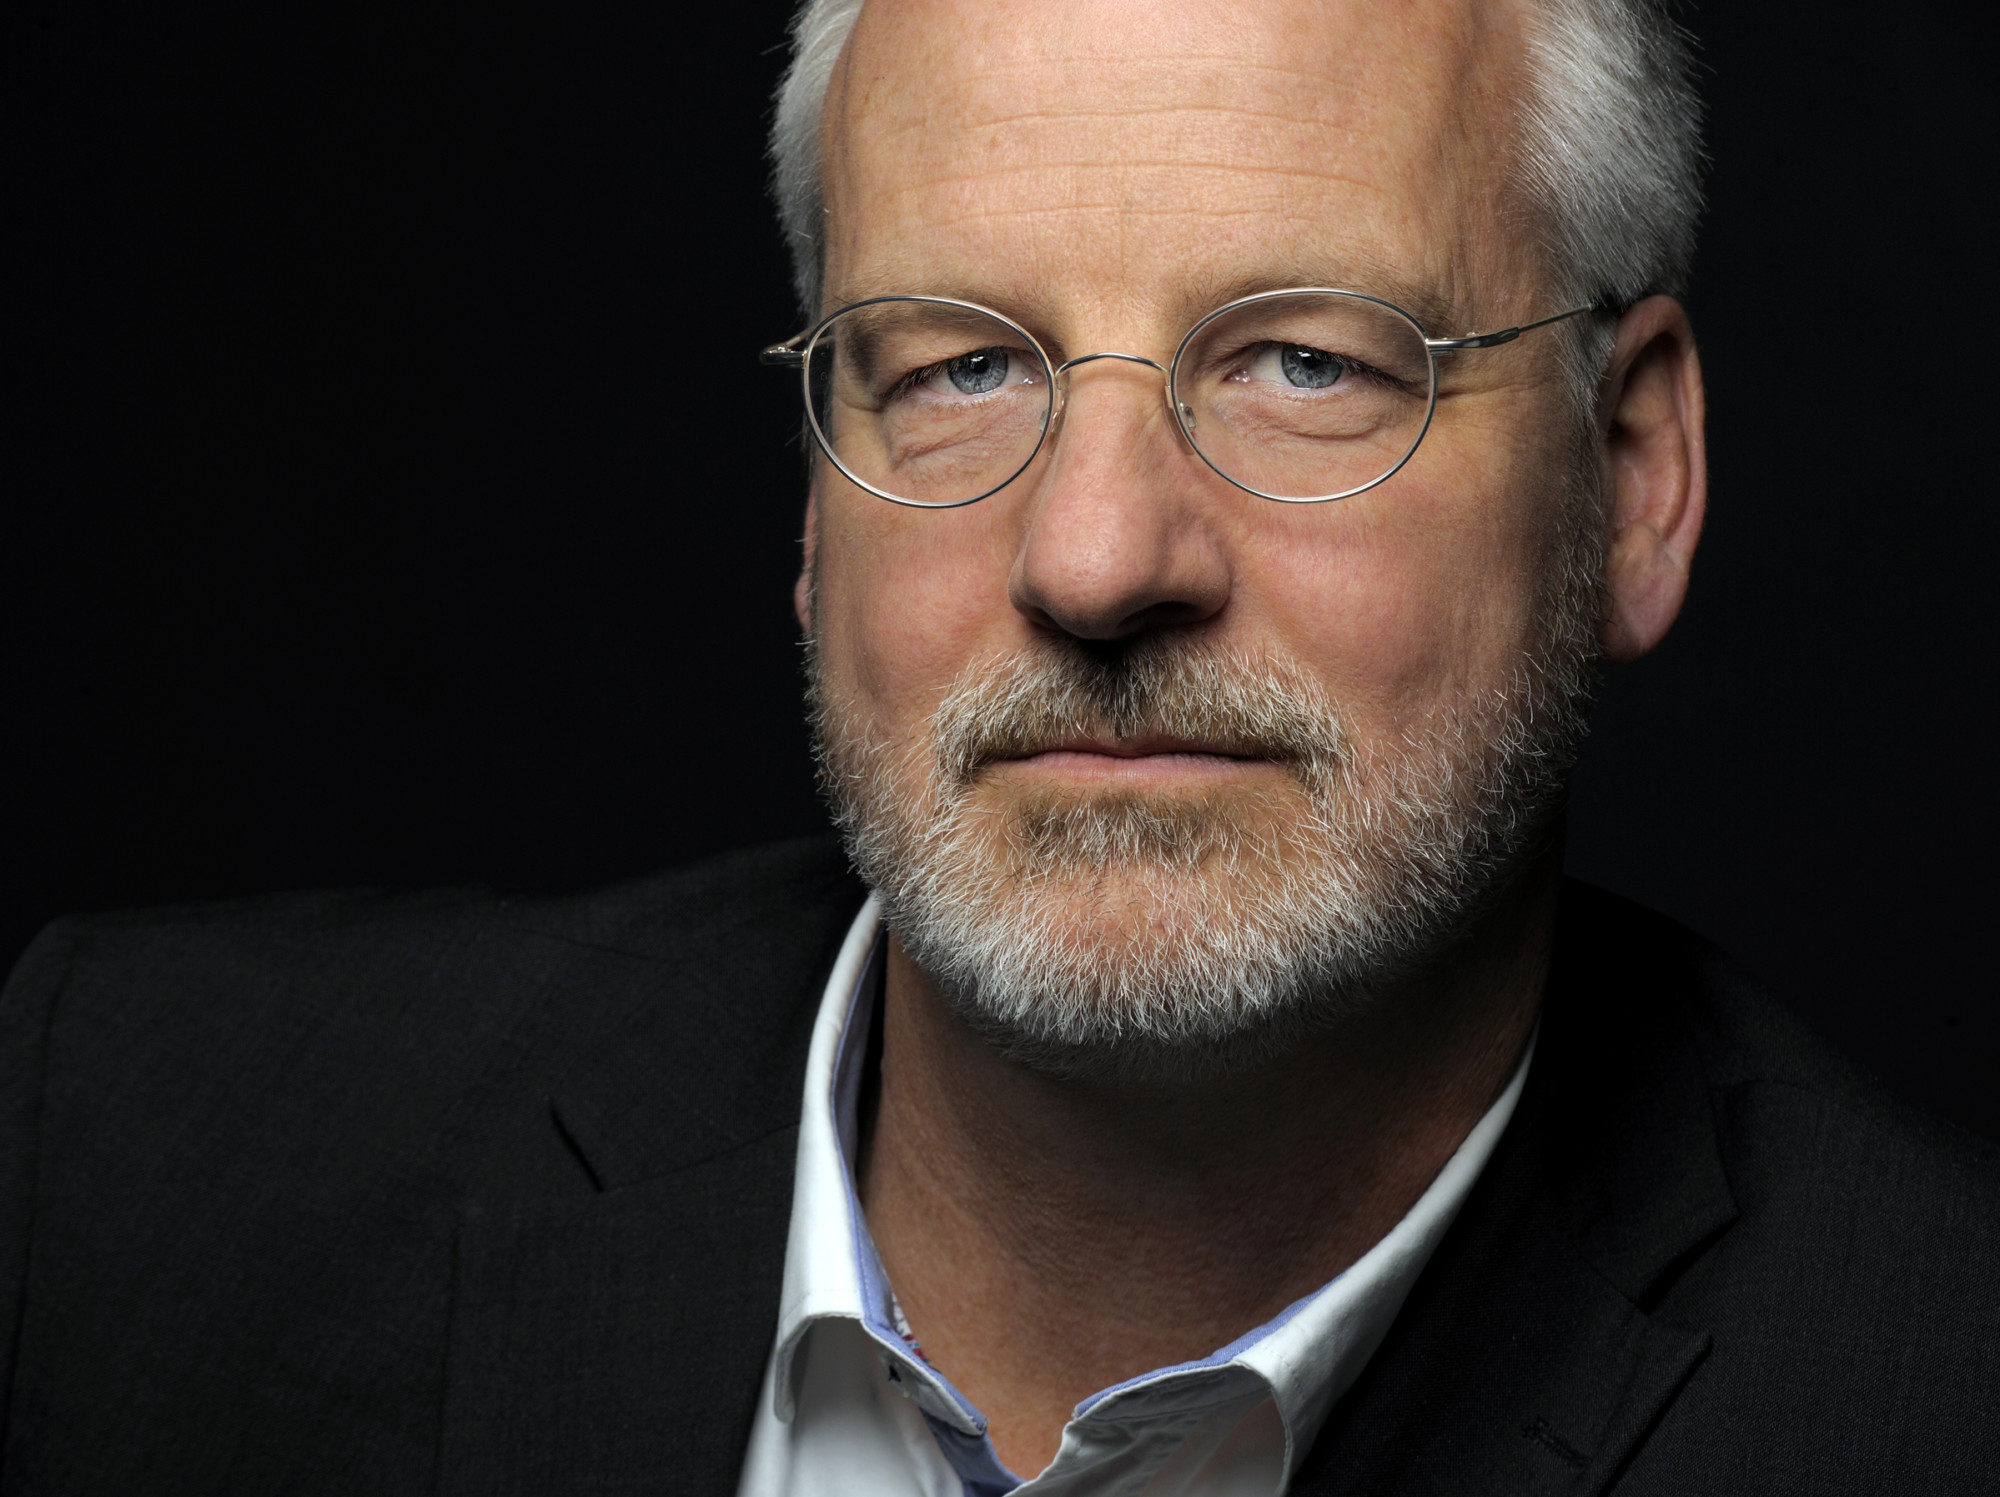 Prof. Dr. Dirk Niefanger